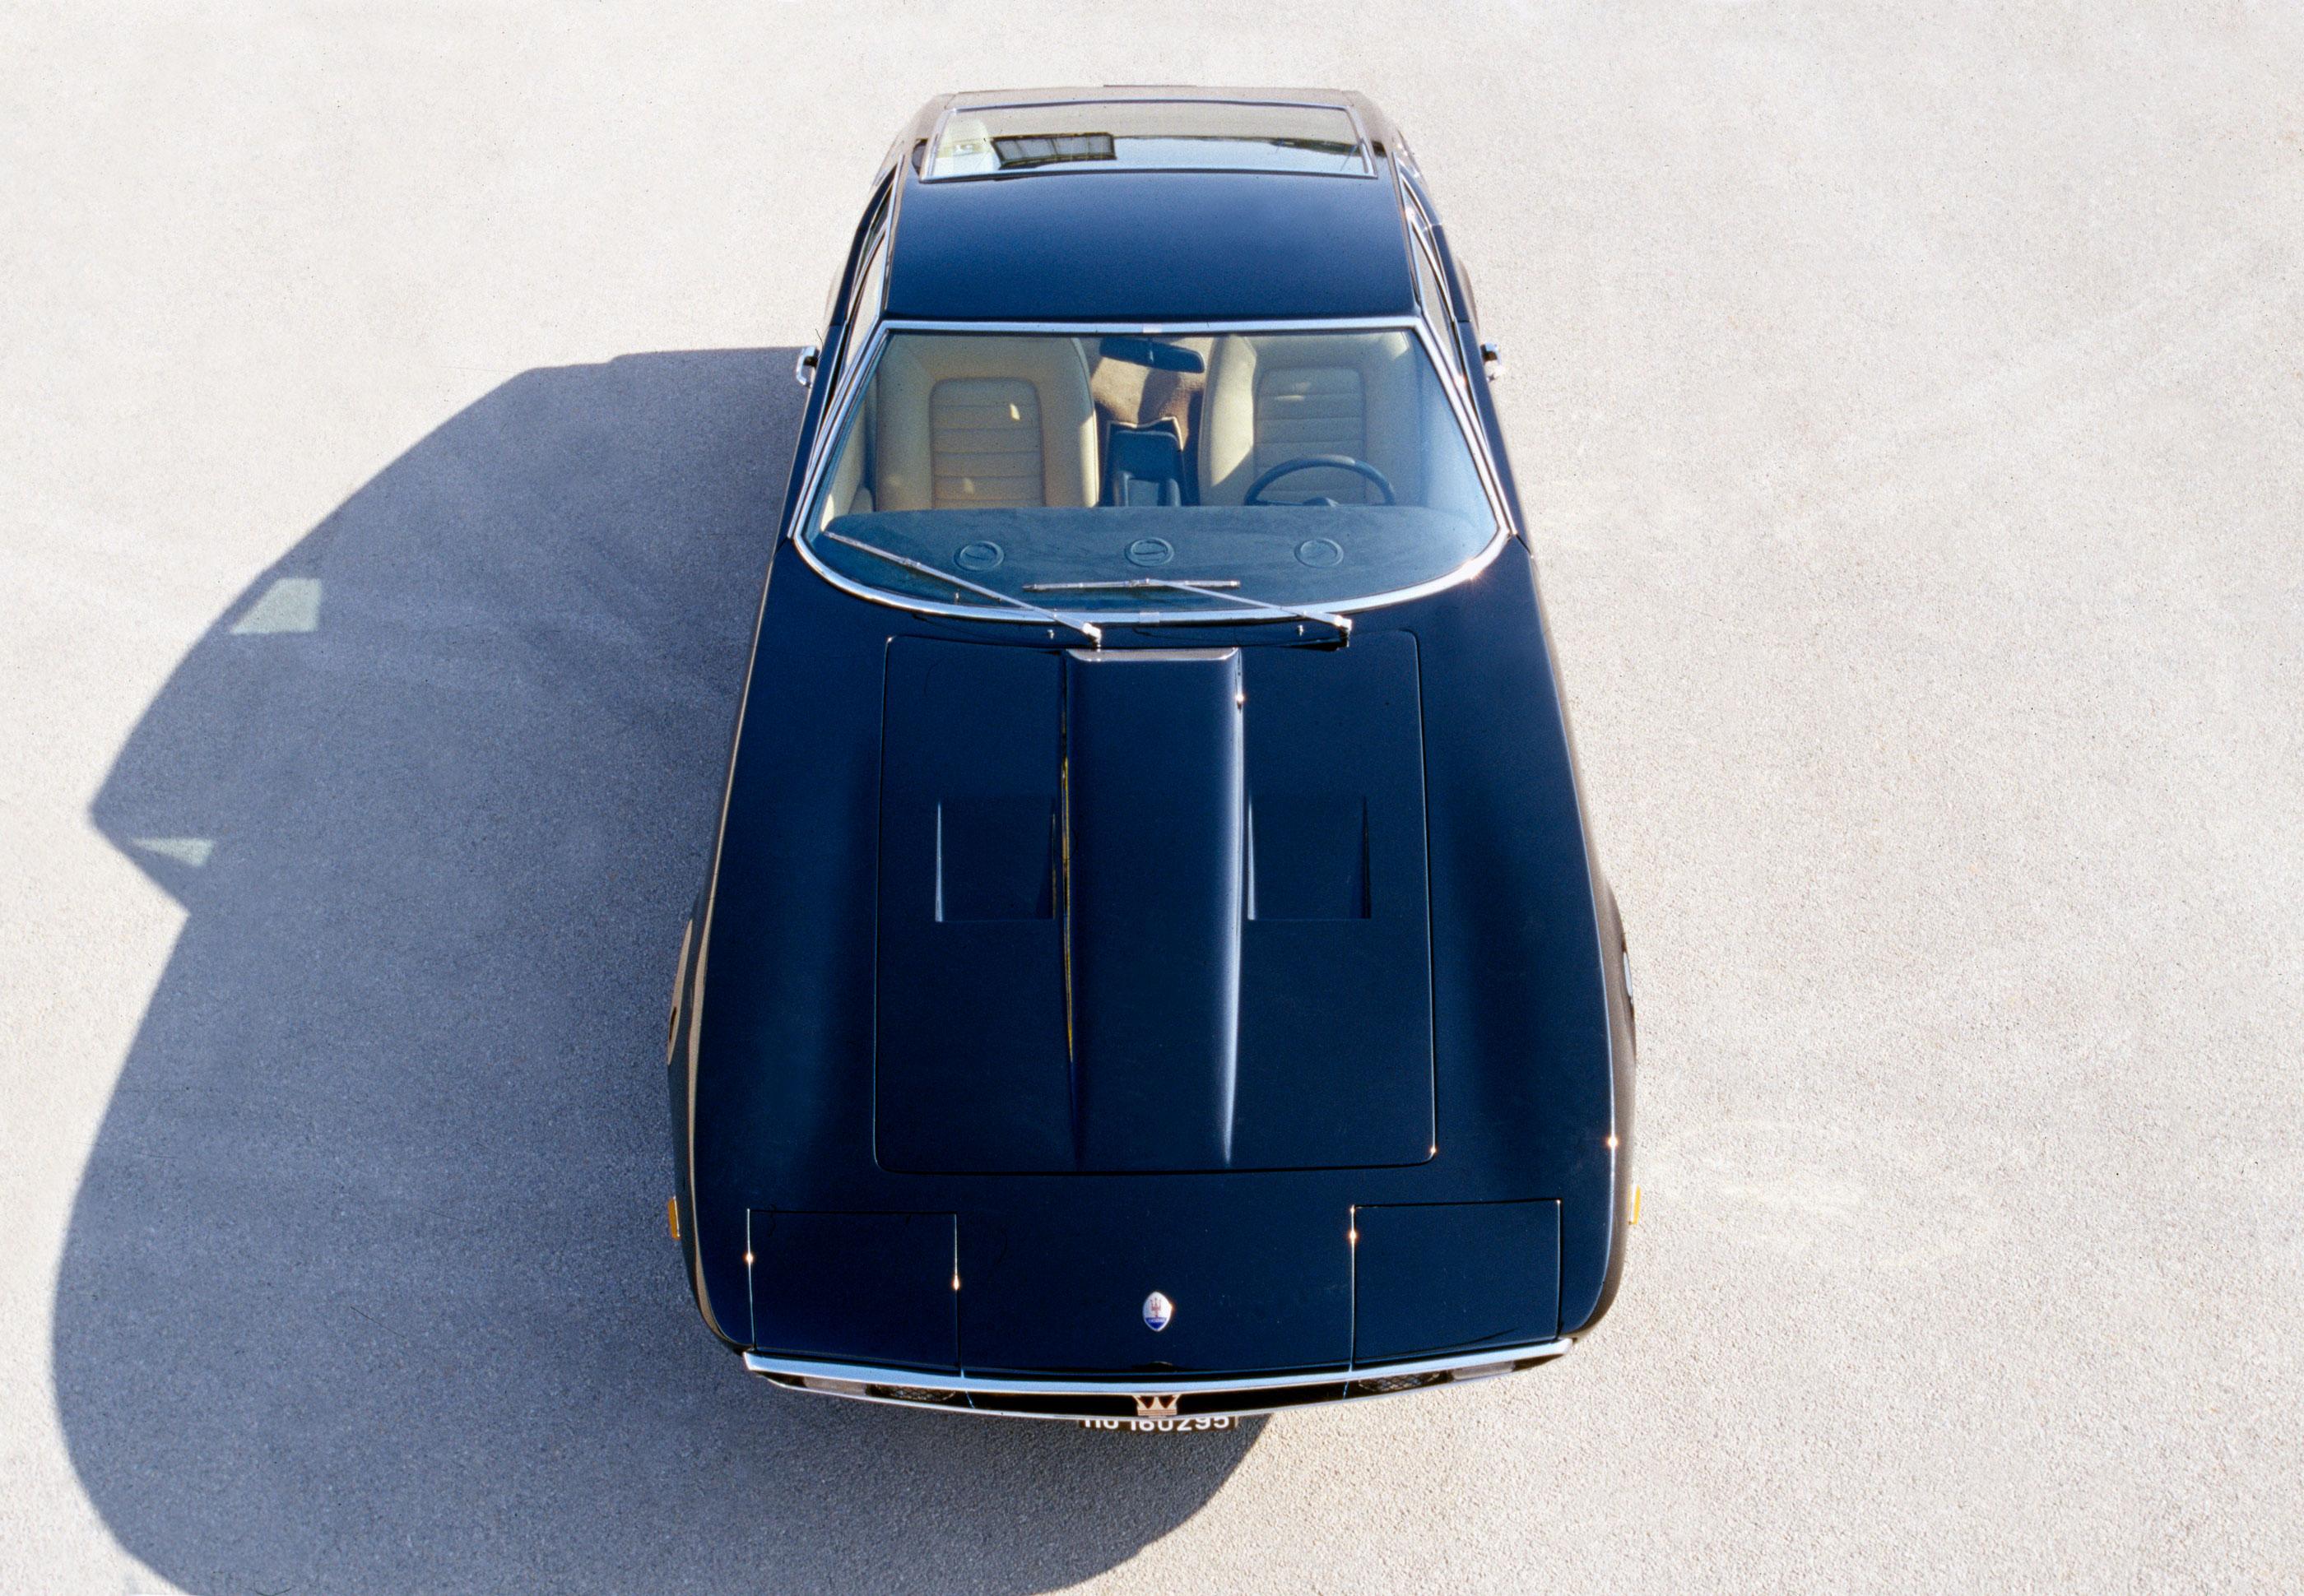 Maserati Ghibli overhead view